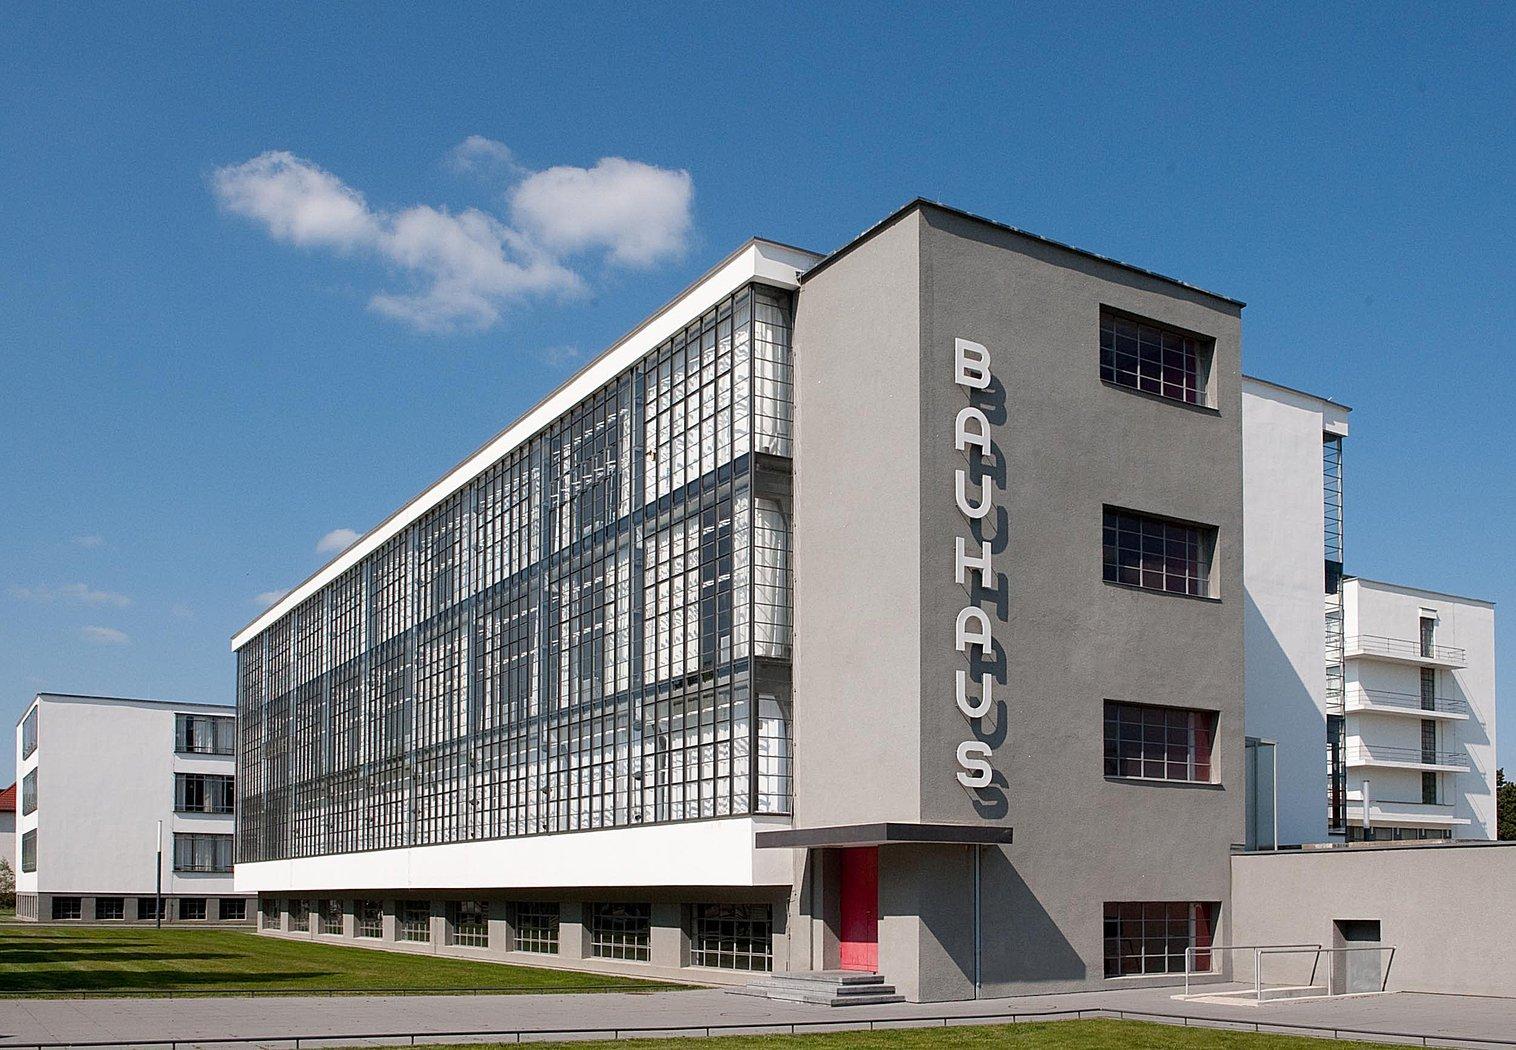 1925 Bauhaus Dessau building